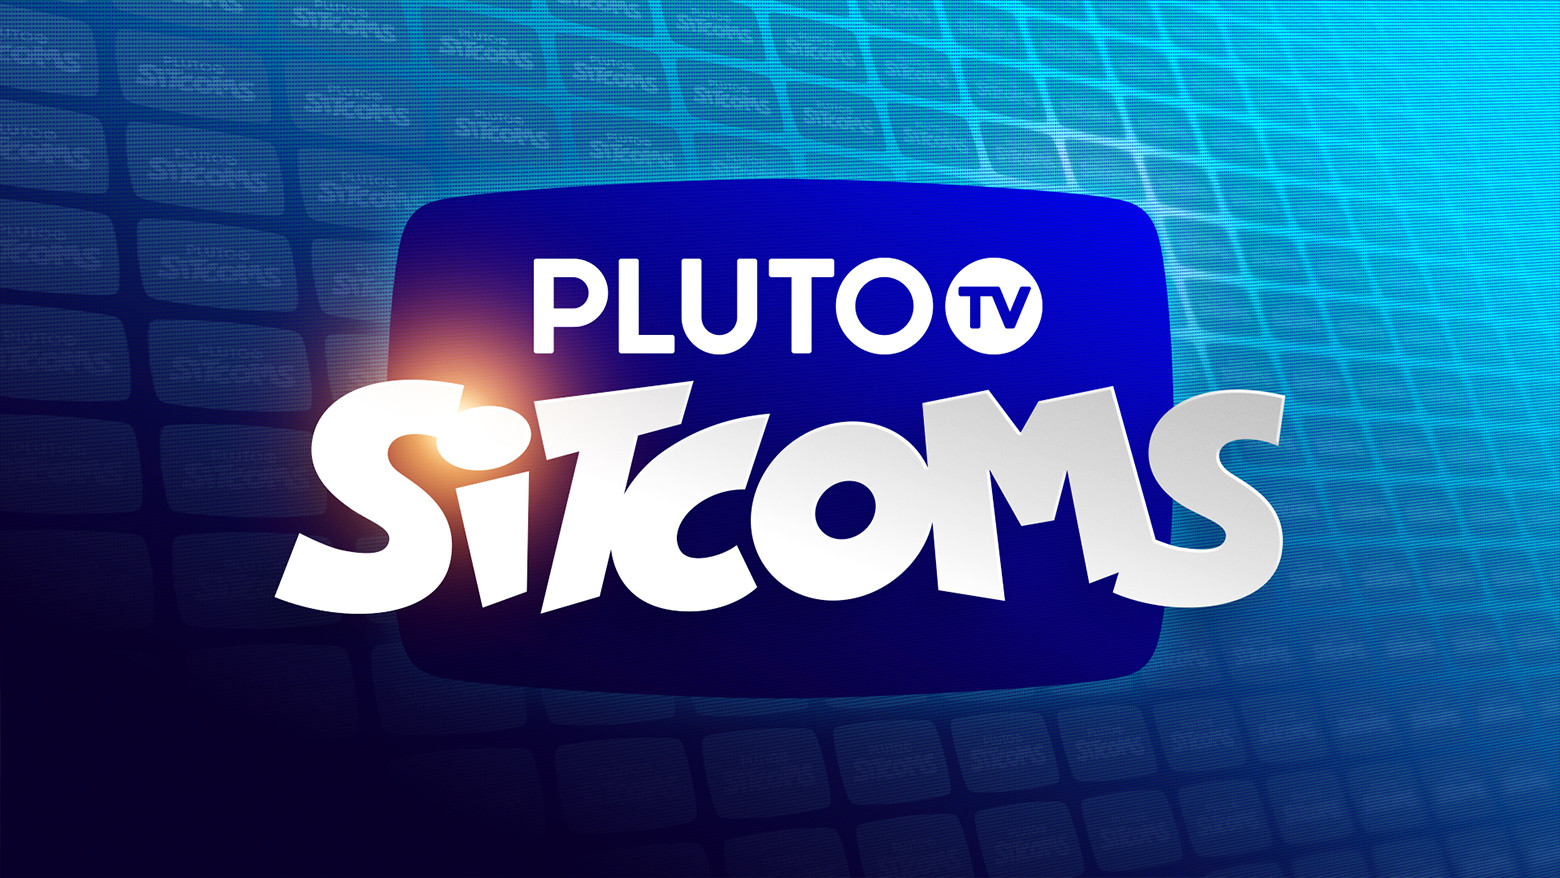 Pluto TV Sitcoms featuredImage.jpg